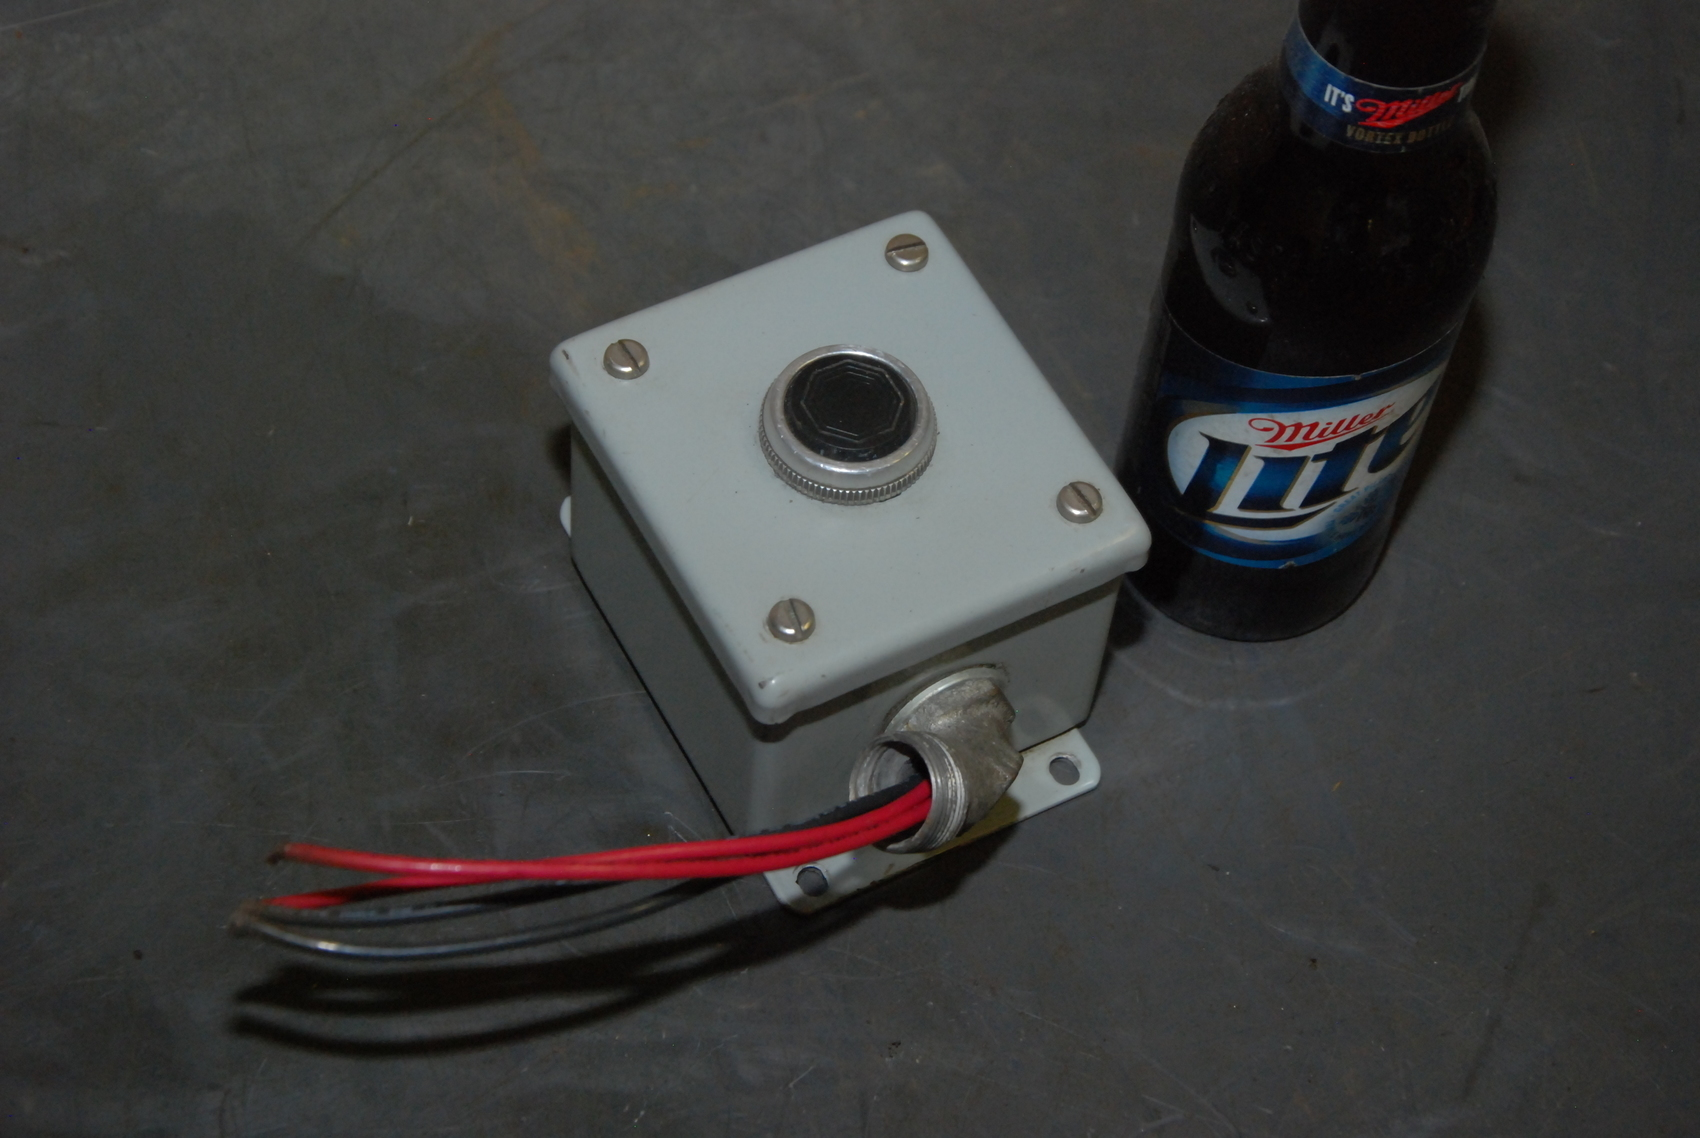 Allen Bradley 800T-A2B Push button in Hoffman enclosure